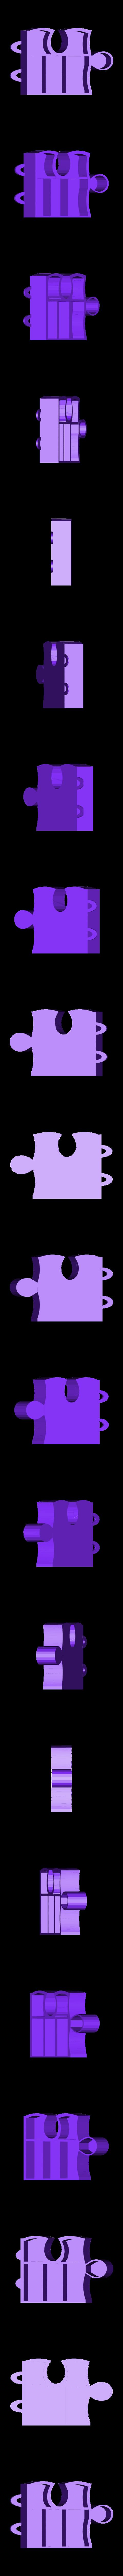 puzzle new 5 accroche.stl Download STL file PUZZLE SHELVES • 3D print model, catf3d